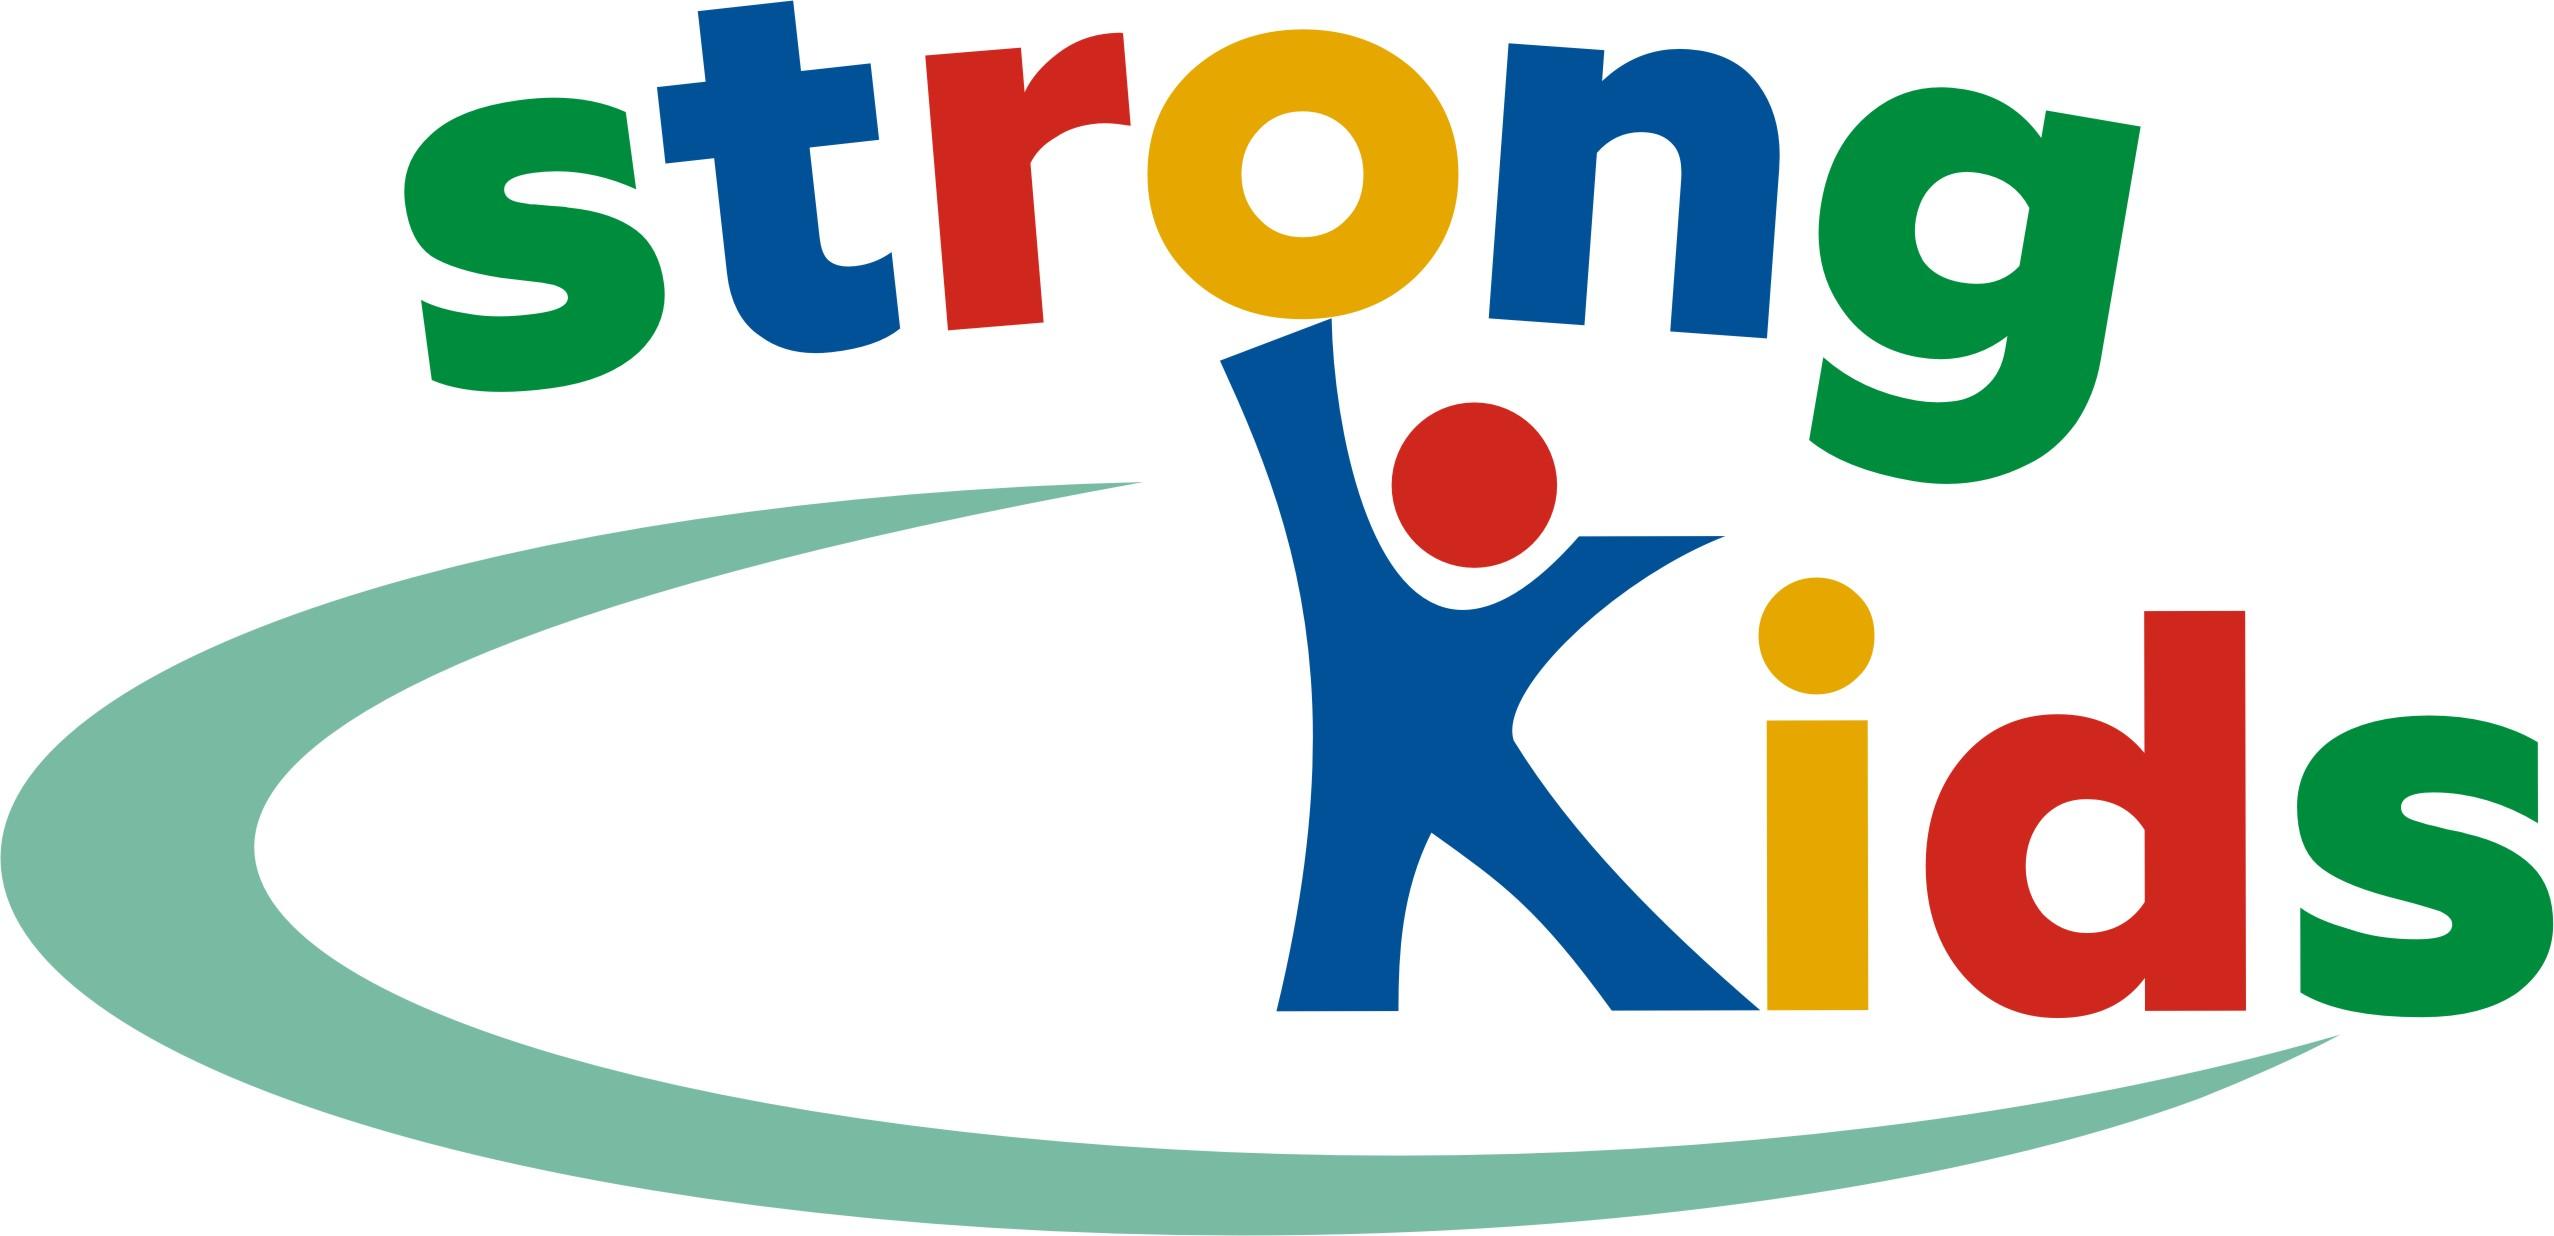 Логотип для Детского Интернет Магазина StrongKids фото f_6425c88f0be2bd66.jpg